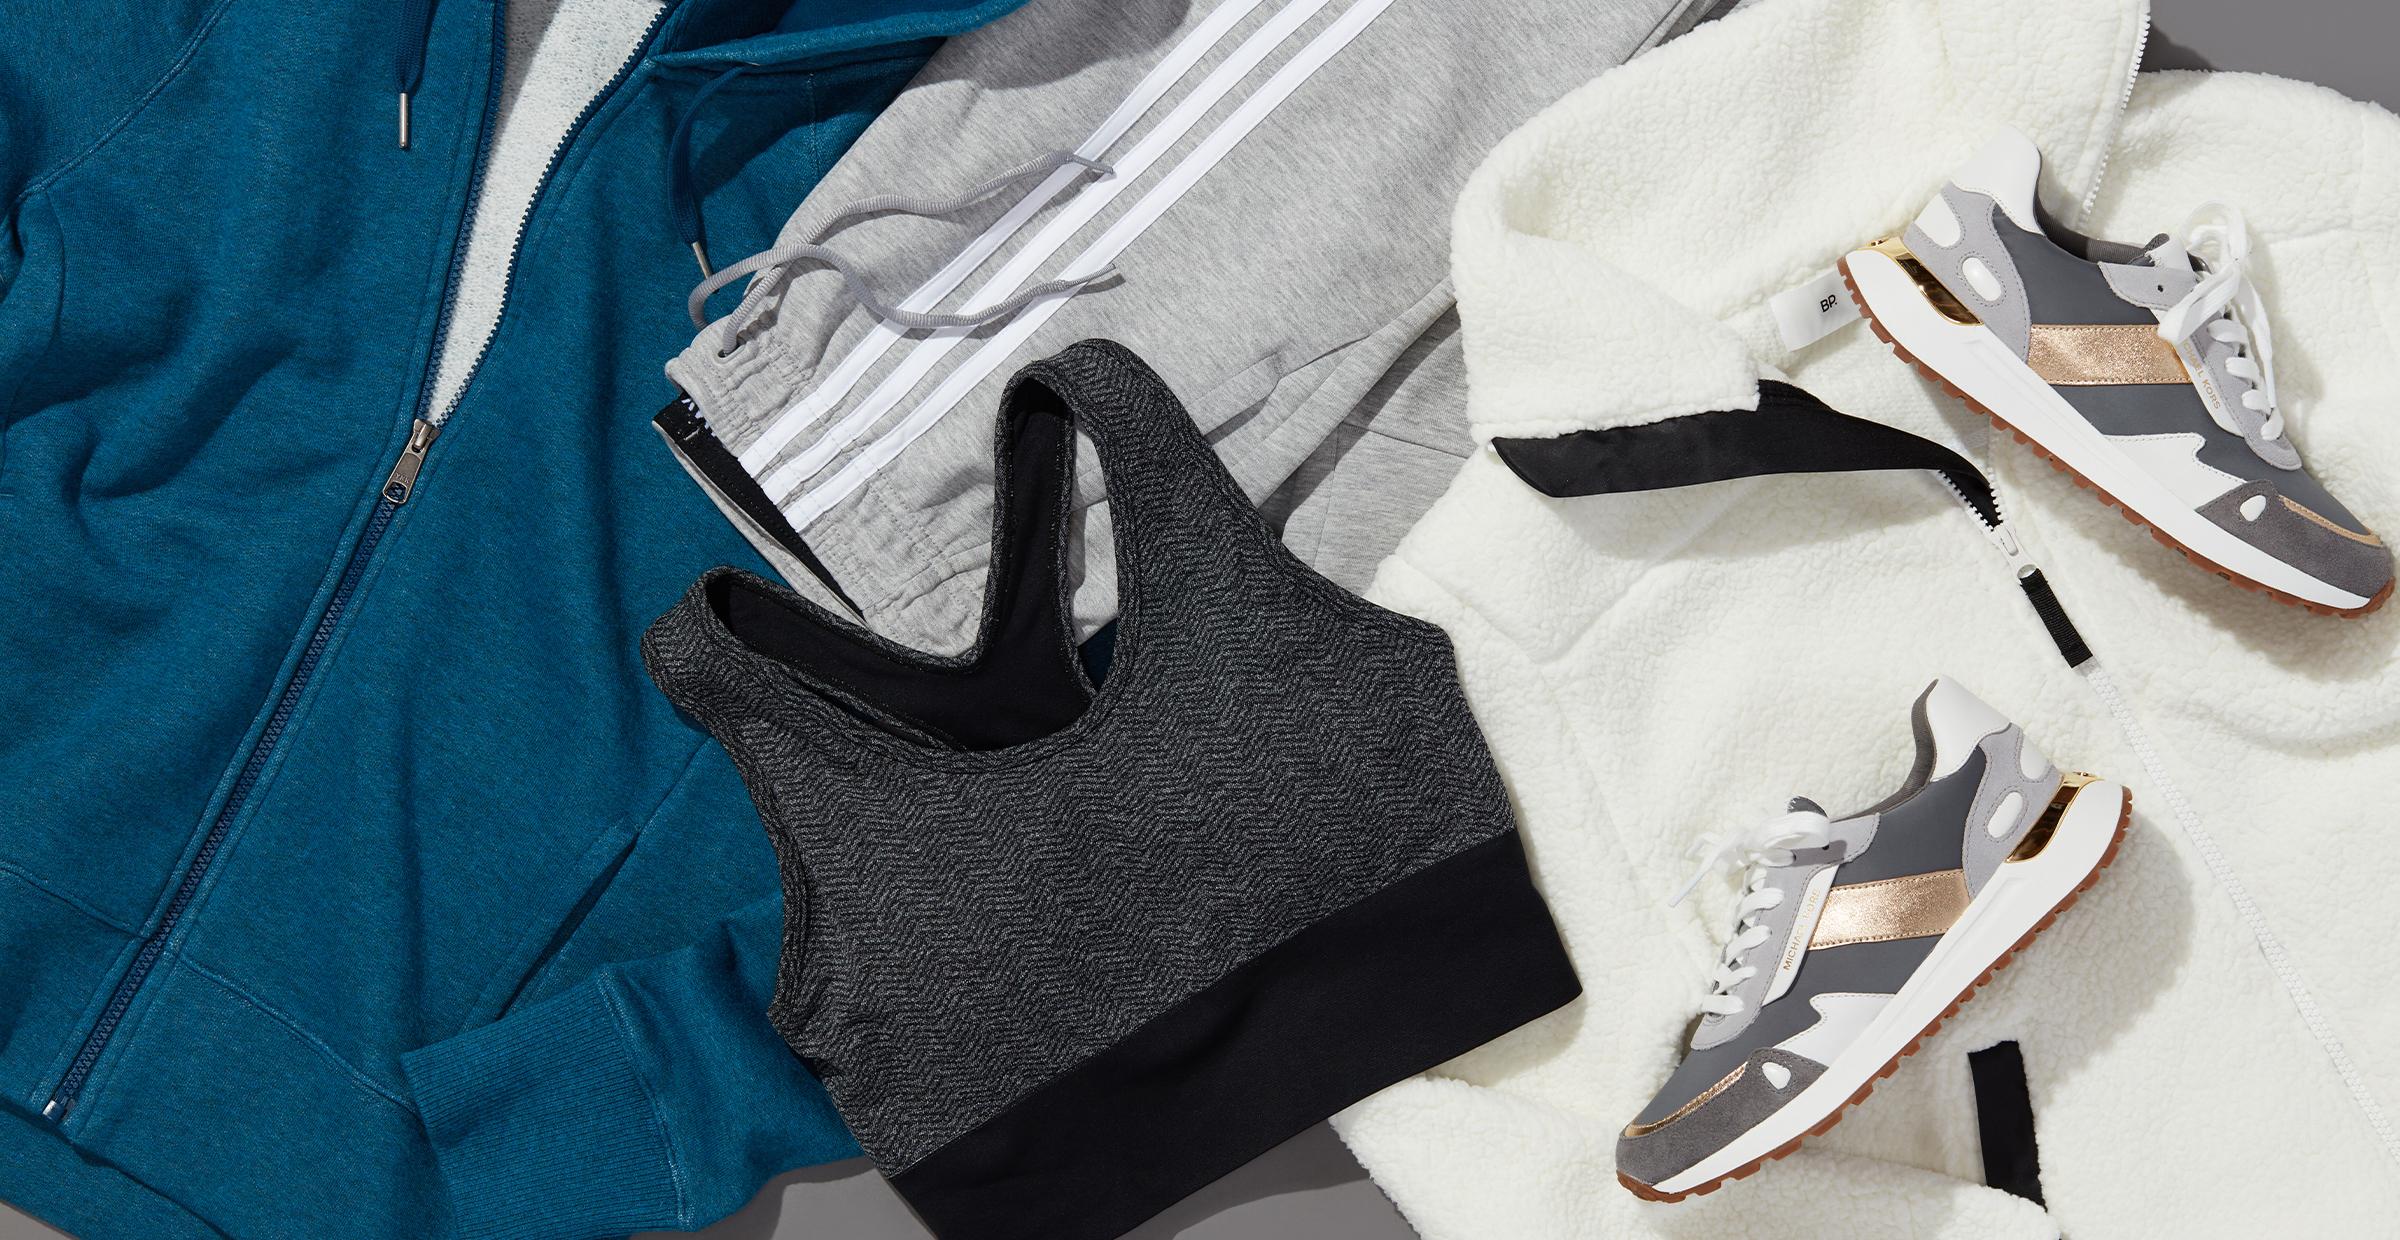 Women's winter activewear clothes